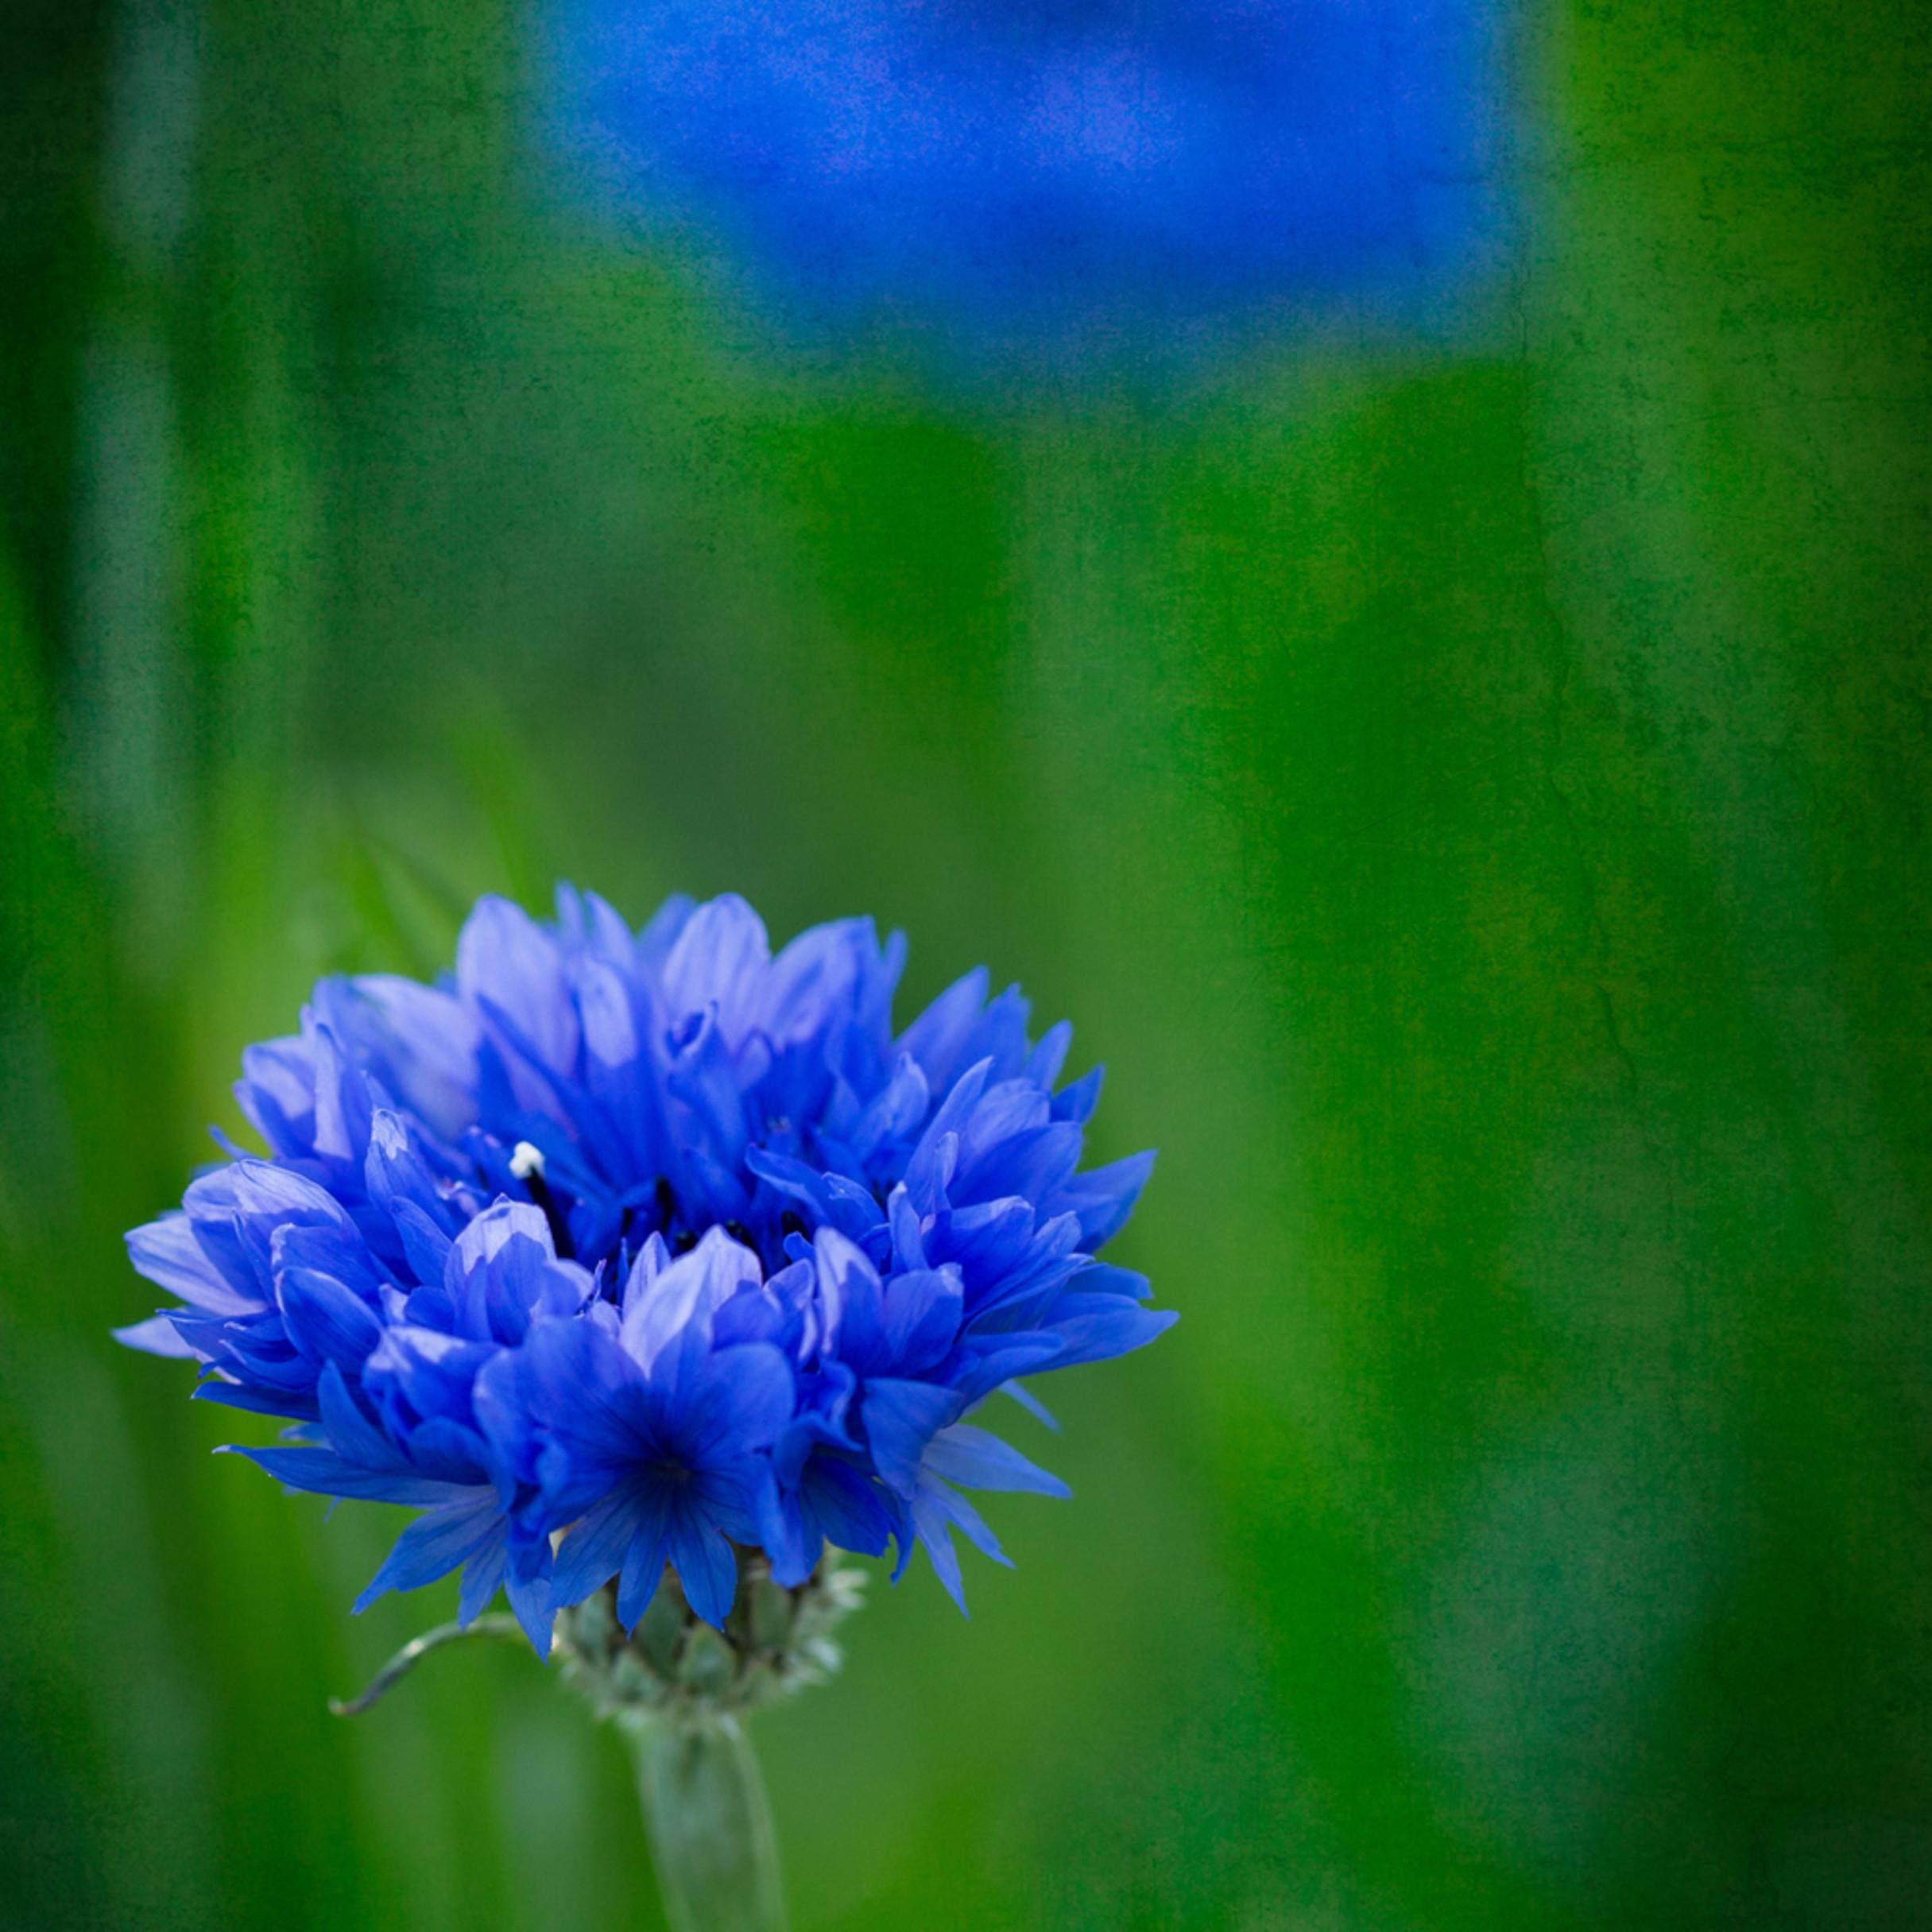 Garden blues oq2vmn